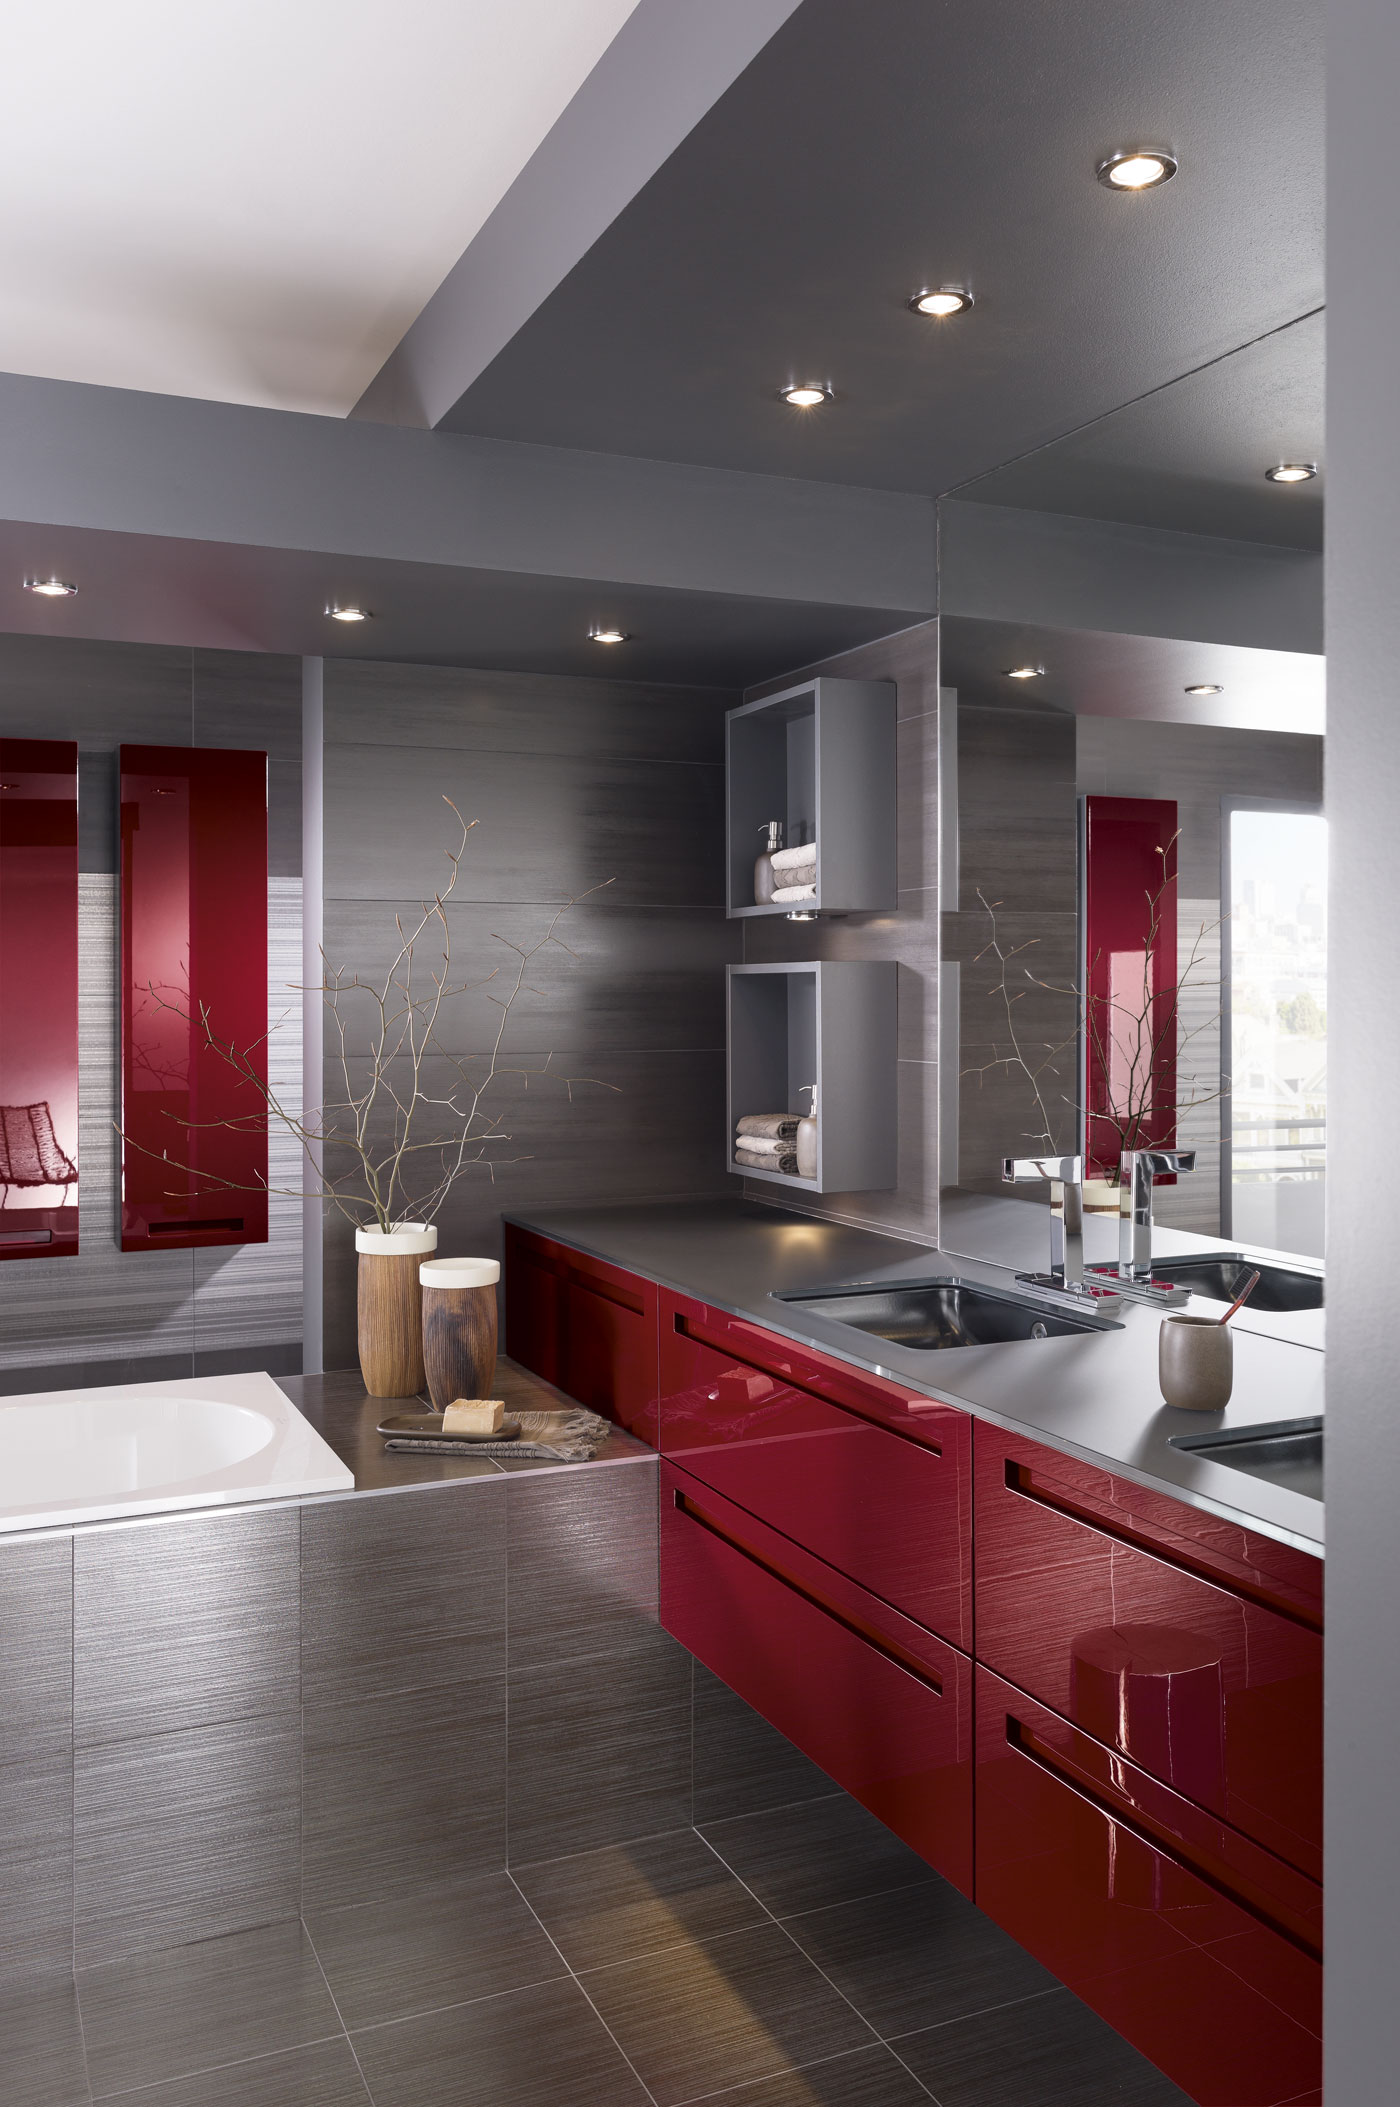 Salle de bain iway laqu rouge rubis brillant perene lyon - Salle de bain perene prix ...